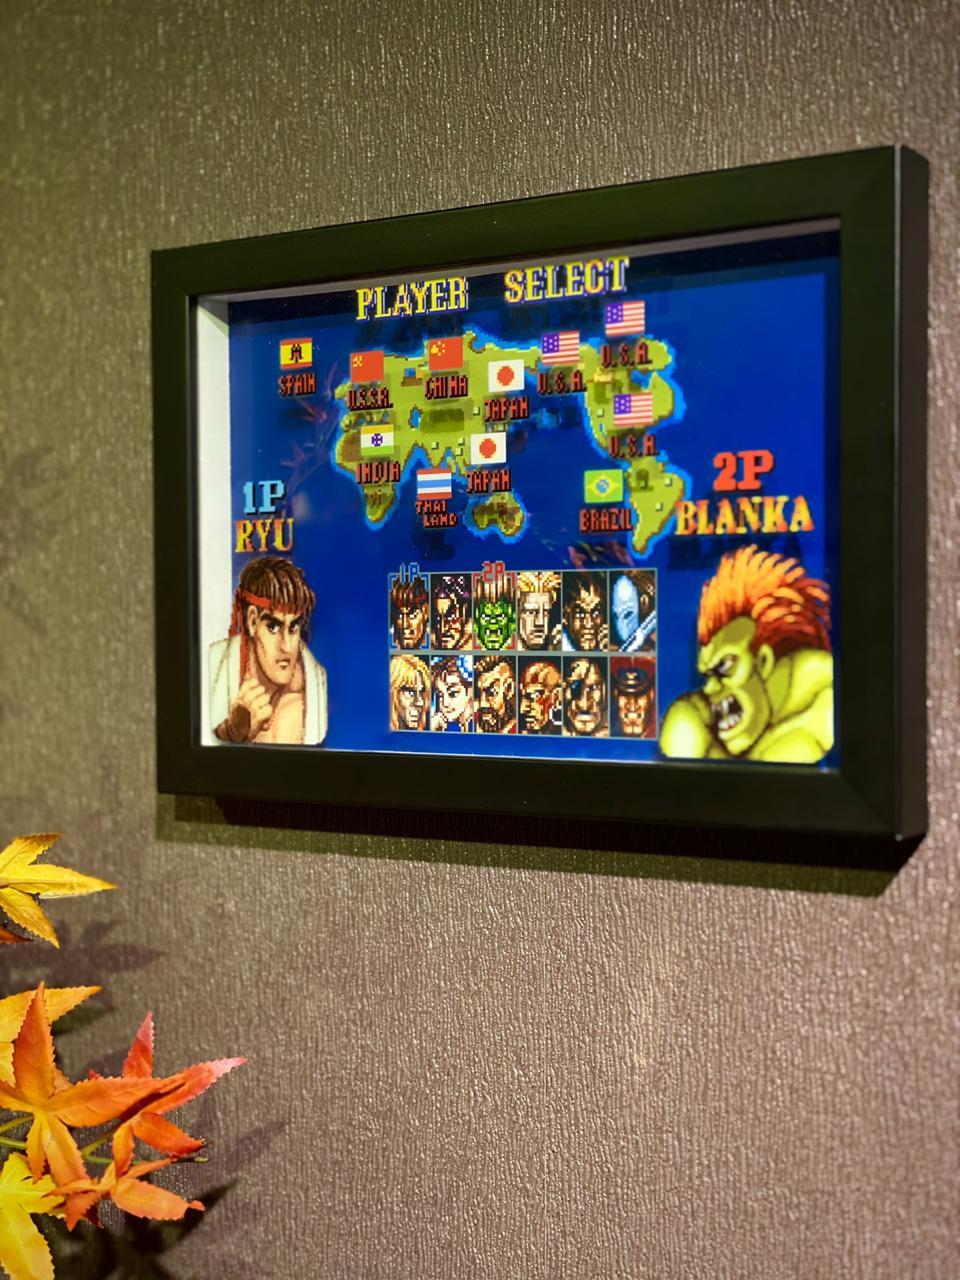 Quadro 3D : Street Fighter: Player Select (Ryu e Blanka)